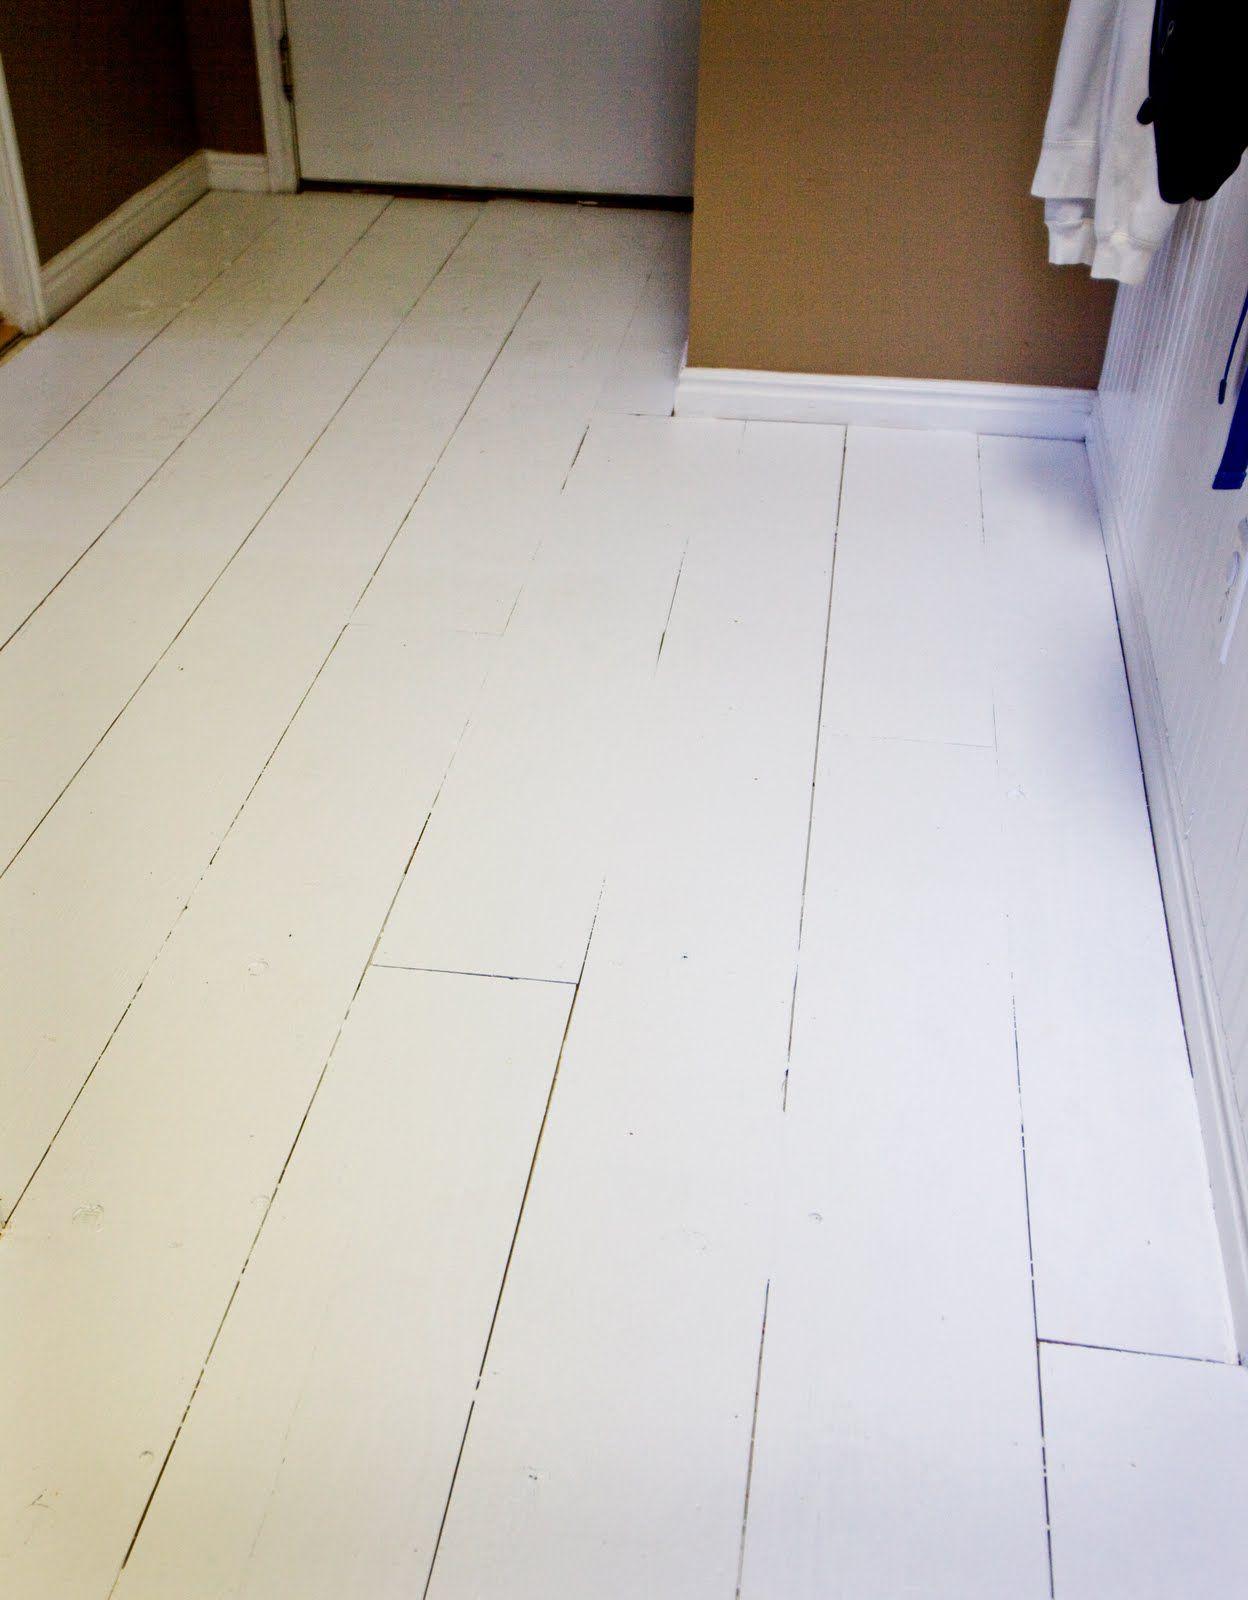 Newfloor Jpg 1 248 215 1 600 Pixels Cheap Flooring Flooring